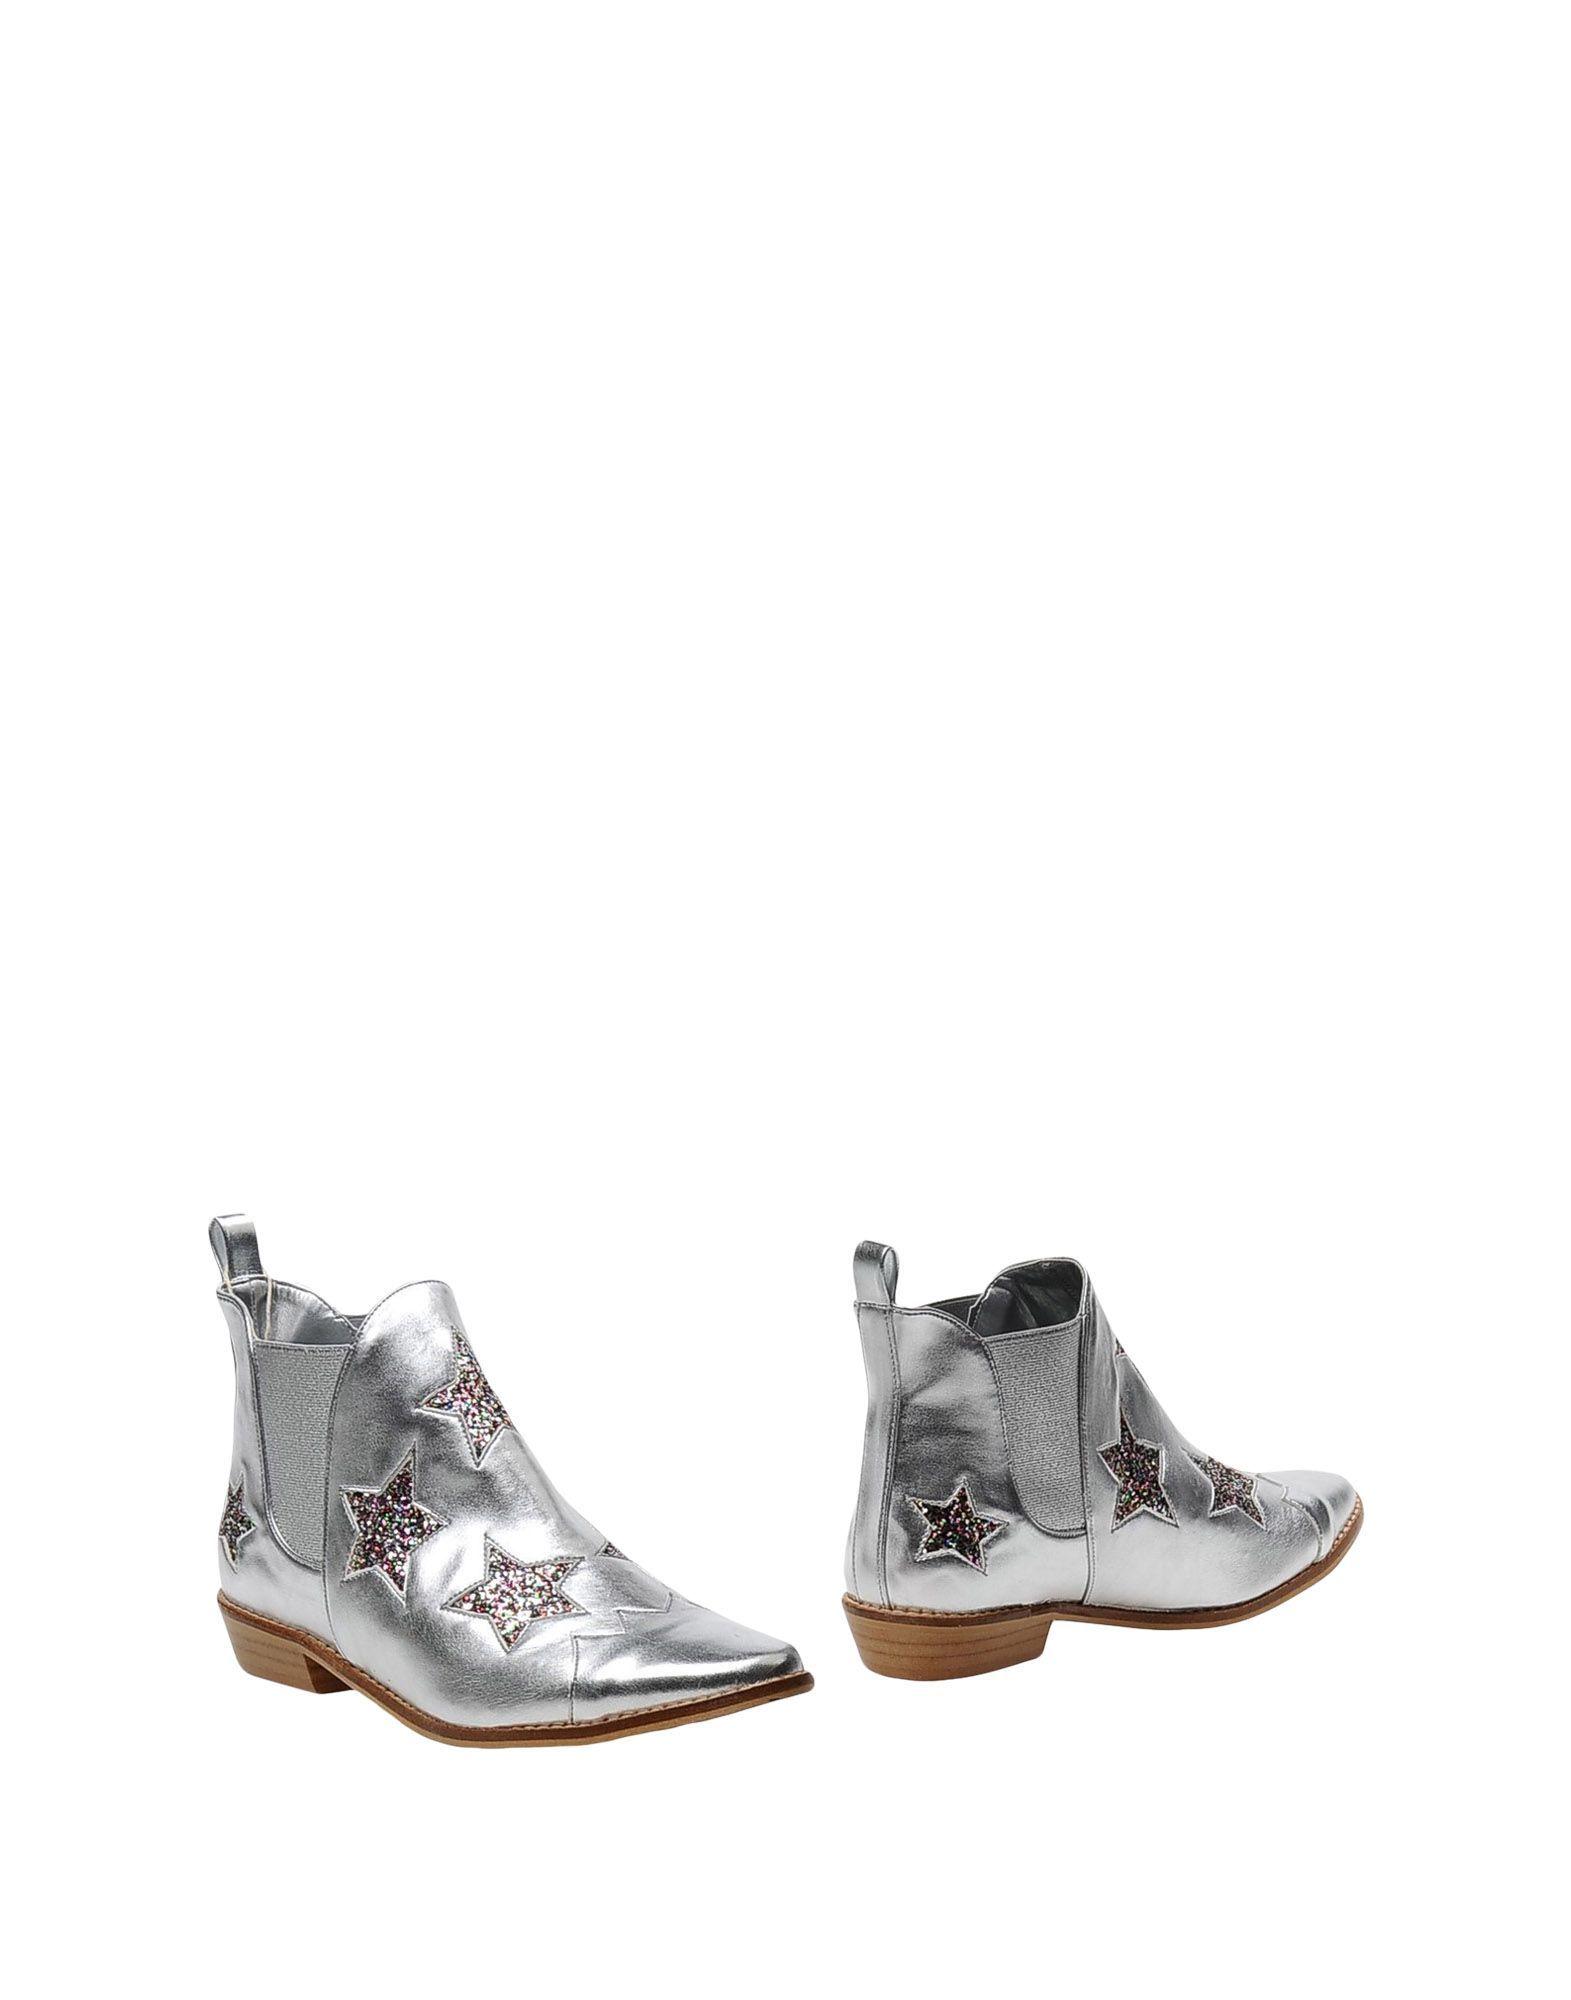 Stella Mccartney Kids Silver Girl Shoes